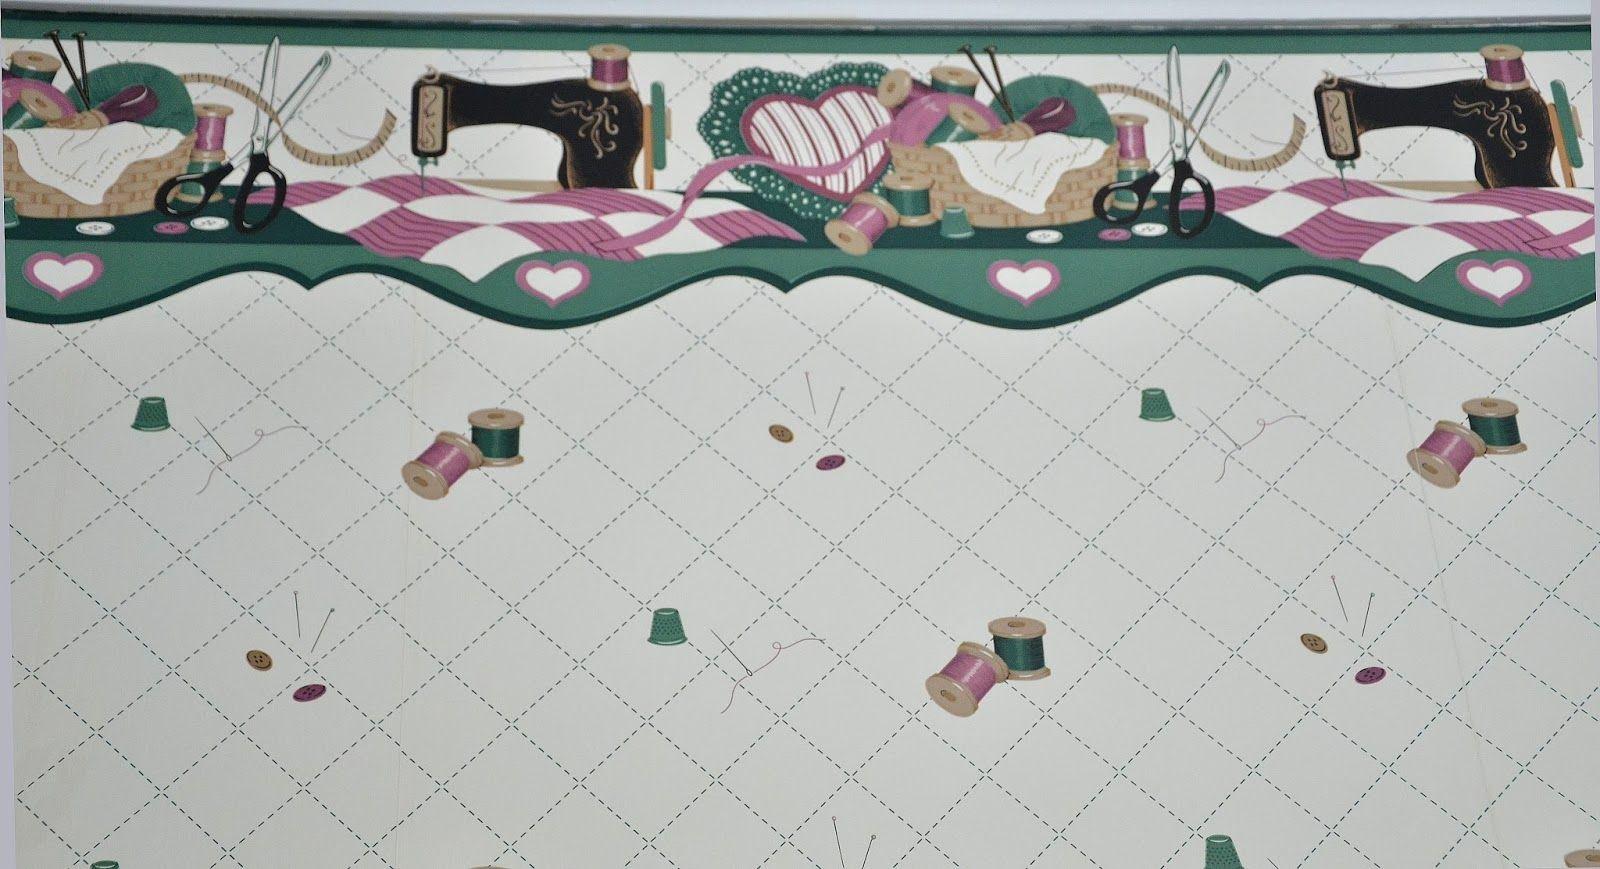 Http 4 Bp Blogspot Com Lrj1gw0i Sk Us6c9jqehji Aaaaaaaacdc 8tfnhemugna S1600 Sewing Wallpaper Jpg Sewing Room Design Vintage Sewing Machines Theme